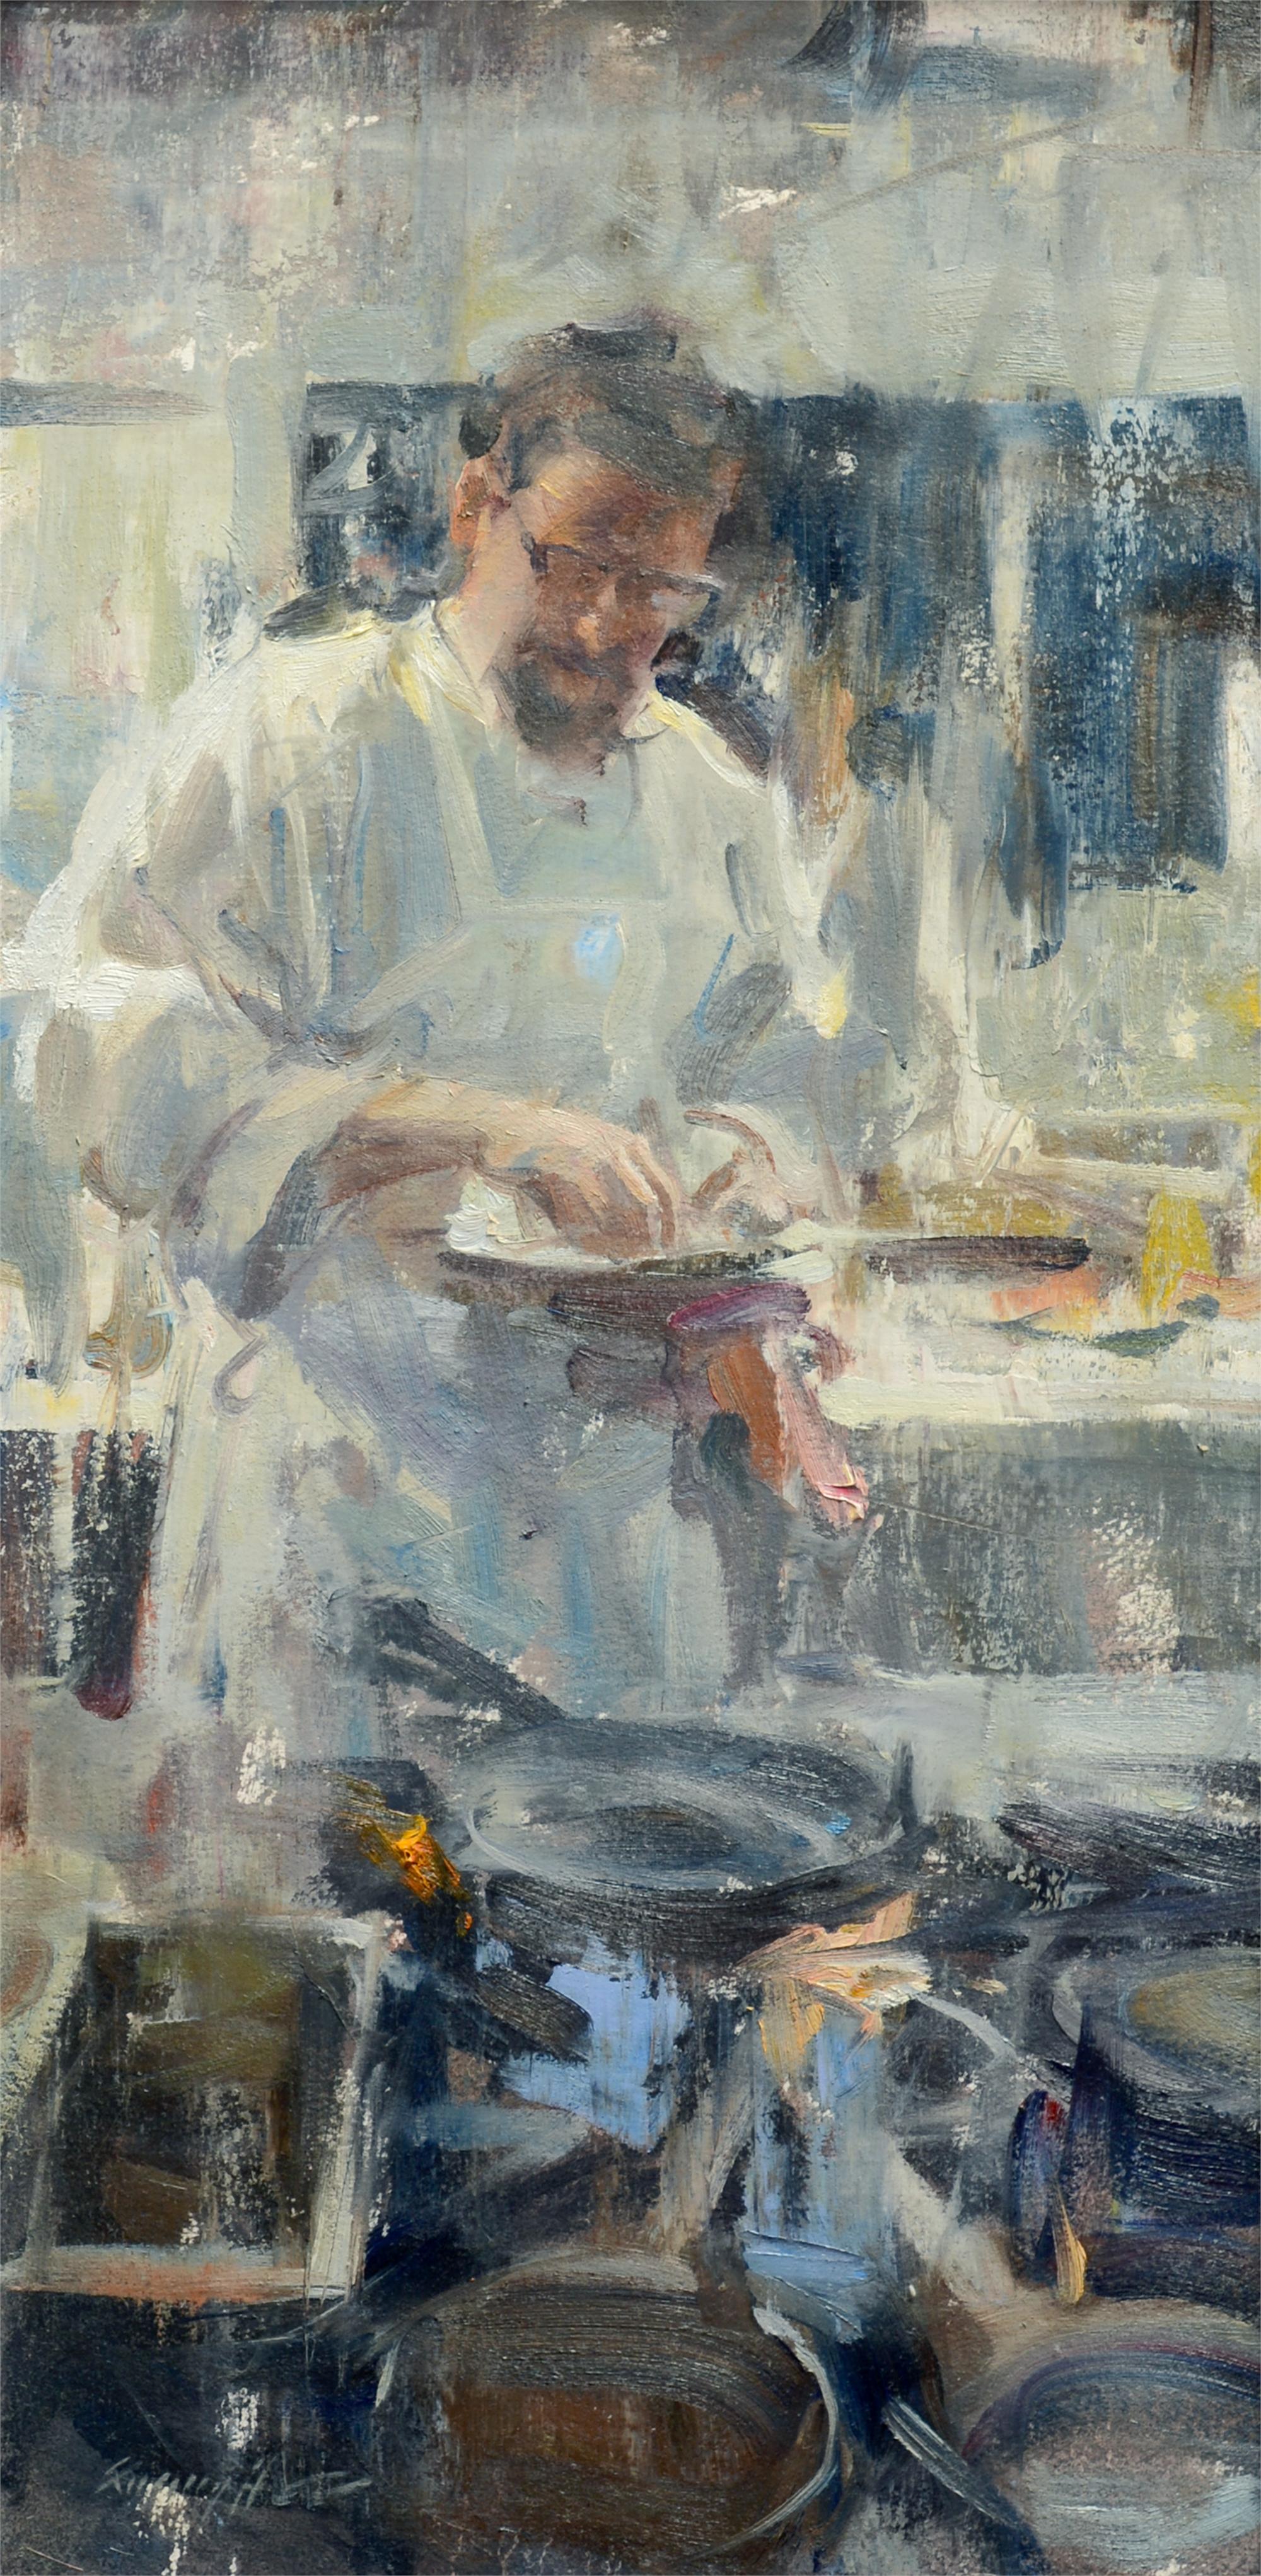 Head Chef - Luca D' Italia by Quang Ho